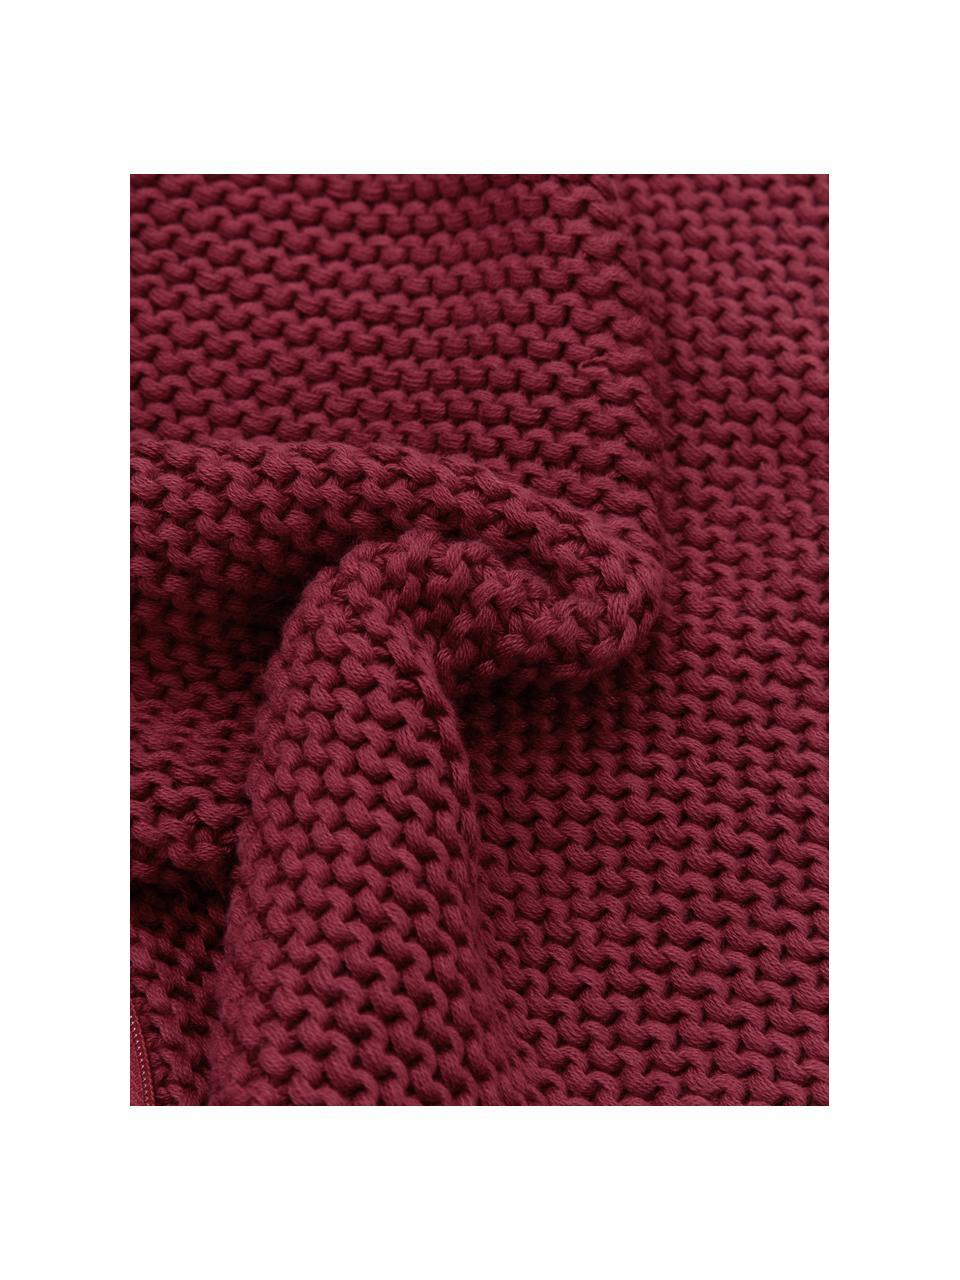 Strick-Kissenhülle Adalyn aus Bio-Baumwolle in Dunkelrot, 100% Bio-Baumwolle, GOTS-zertifiziert, Dunkelrot, 40 x 40 cm